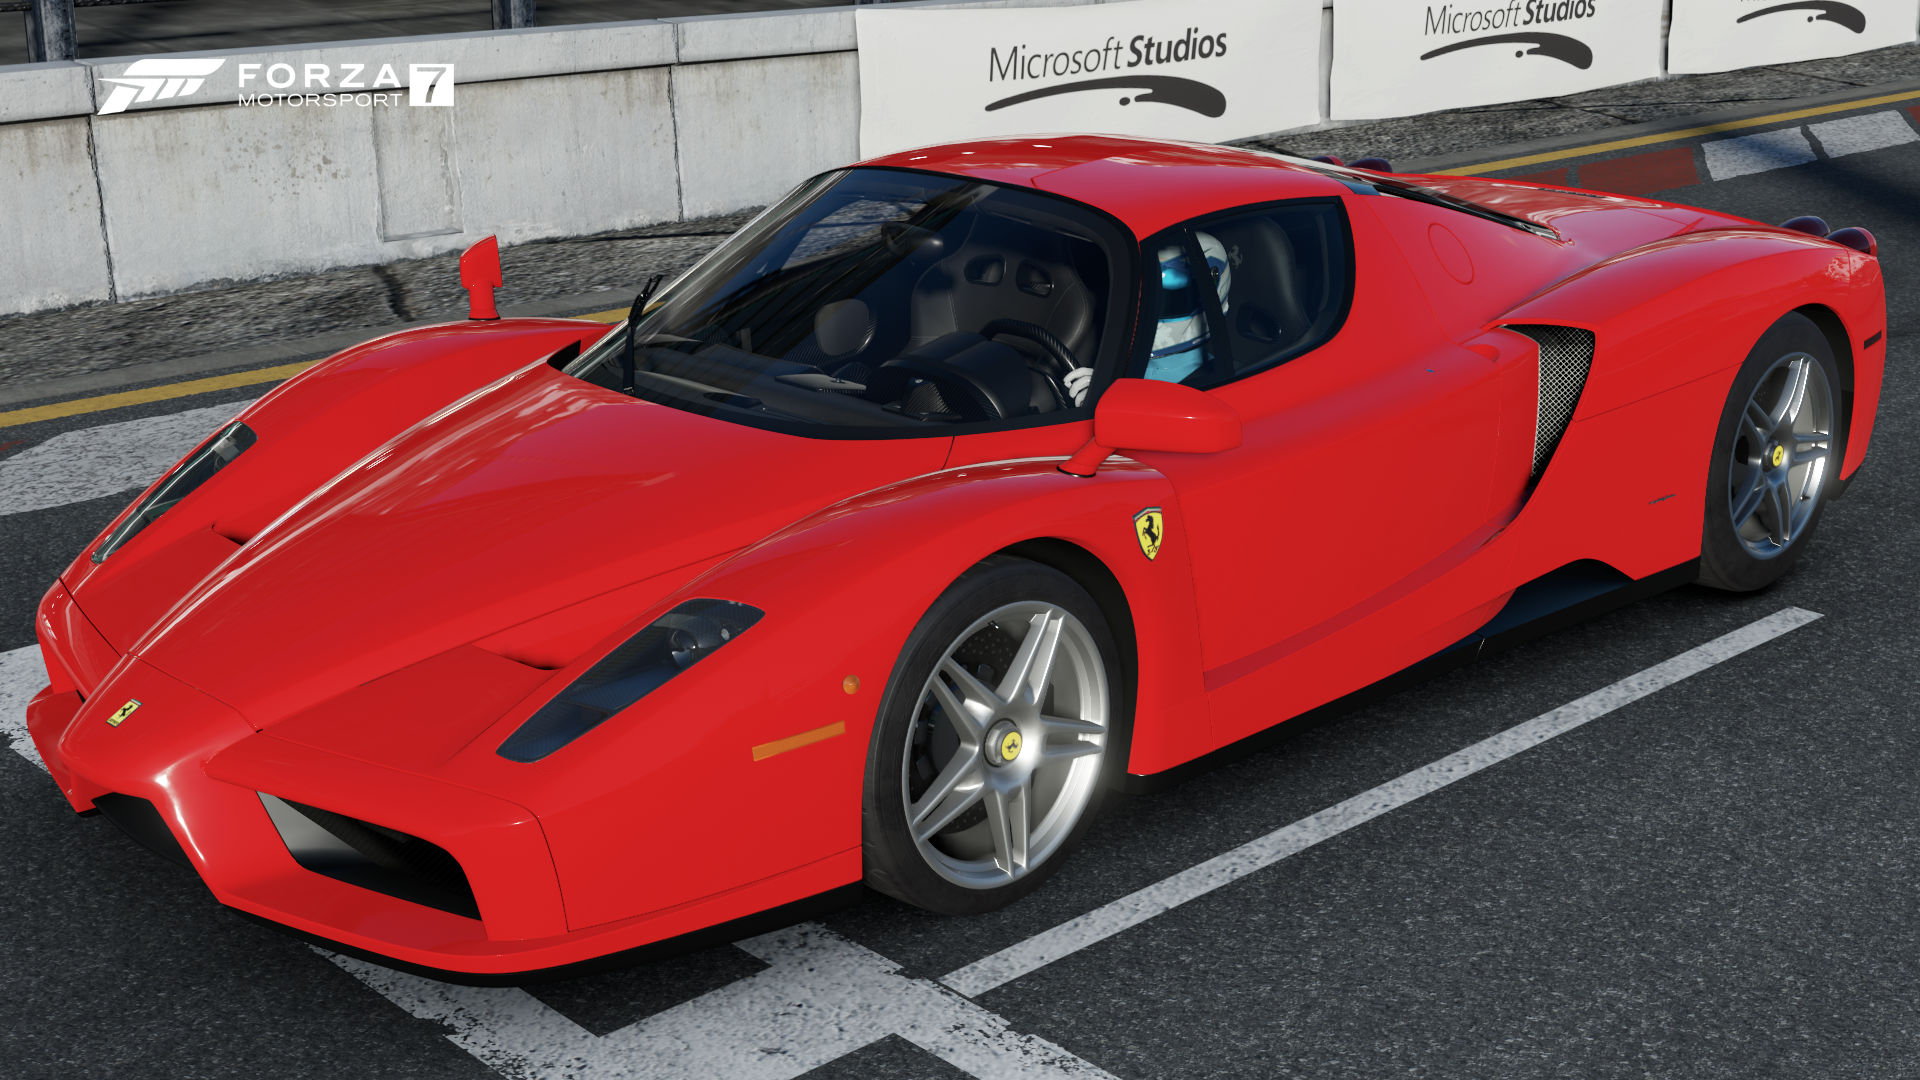 Ferrari Enzo F on ferrari f310, ferrari f50, ferrari f2005, ferrari millechili, ferrari fxx, ferrari 458 italia, ferrari f2004, ferrari f type, ferrari f10, ferrari 458 speciale wallpaper, red bull rb5, ferrari f2008, ferrari f2007, ferrari f70, ferrari f2003-ga, lamborghini enzo, f40 f50 enzo, ferrari f2002, gemballa enzo, ferrari 412t, ferrari f399, williams fw31, ferrari 288 gto, ferrari 612 scaglietti, ferrari 2002 models, ferrari f92a, ferrari f2001, ferrari 248 f1, ferrari f1-2000, ferrari f300, ferrari f93a, ferrari 599 gto,